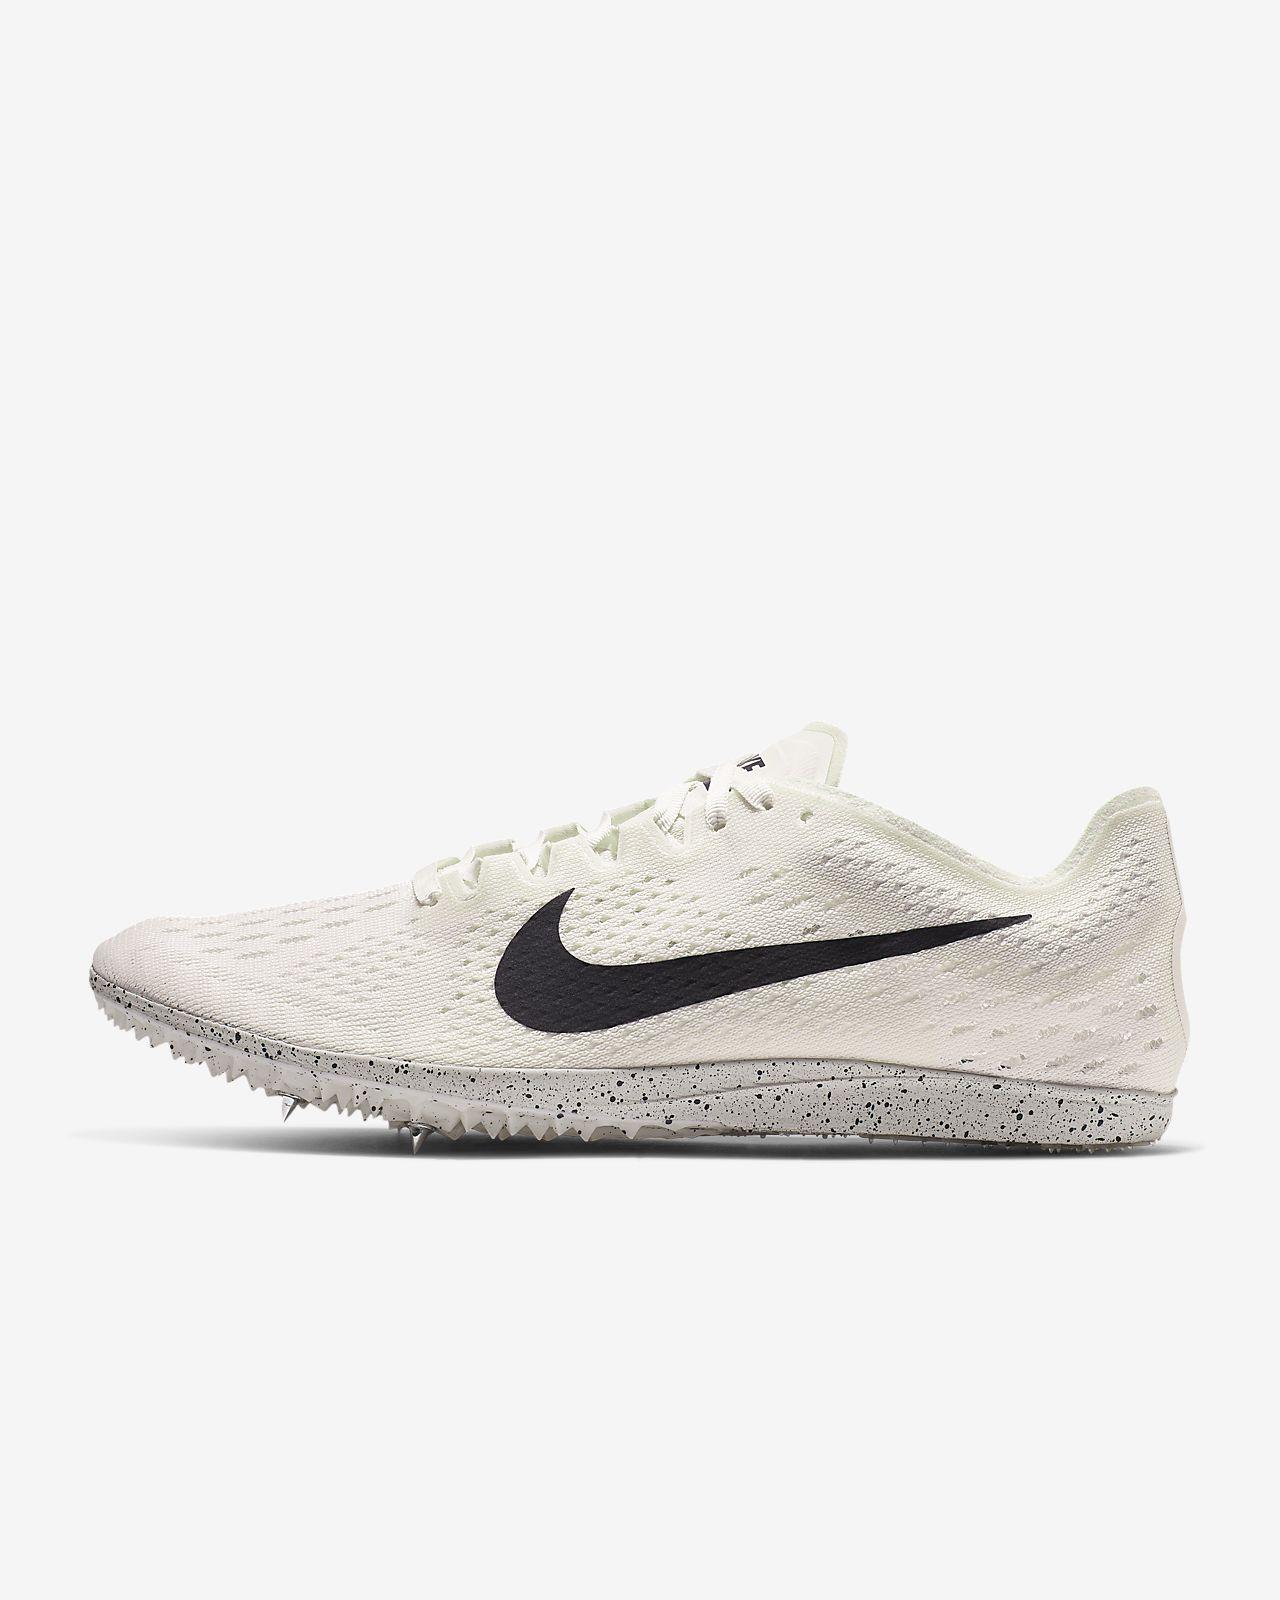 pretty nice 981f7 3f5cb ... Chaussure de course longue distance à pointes mixte Nike Zoom Matumbo 3